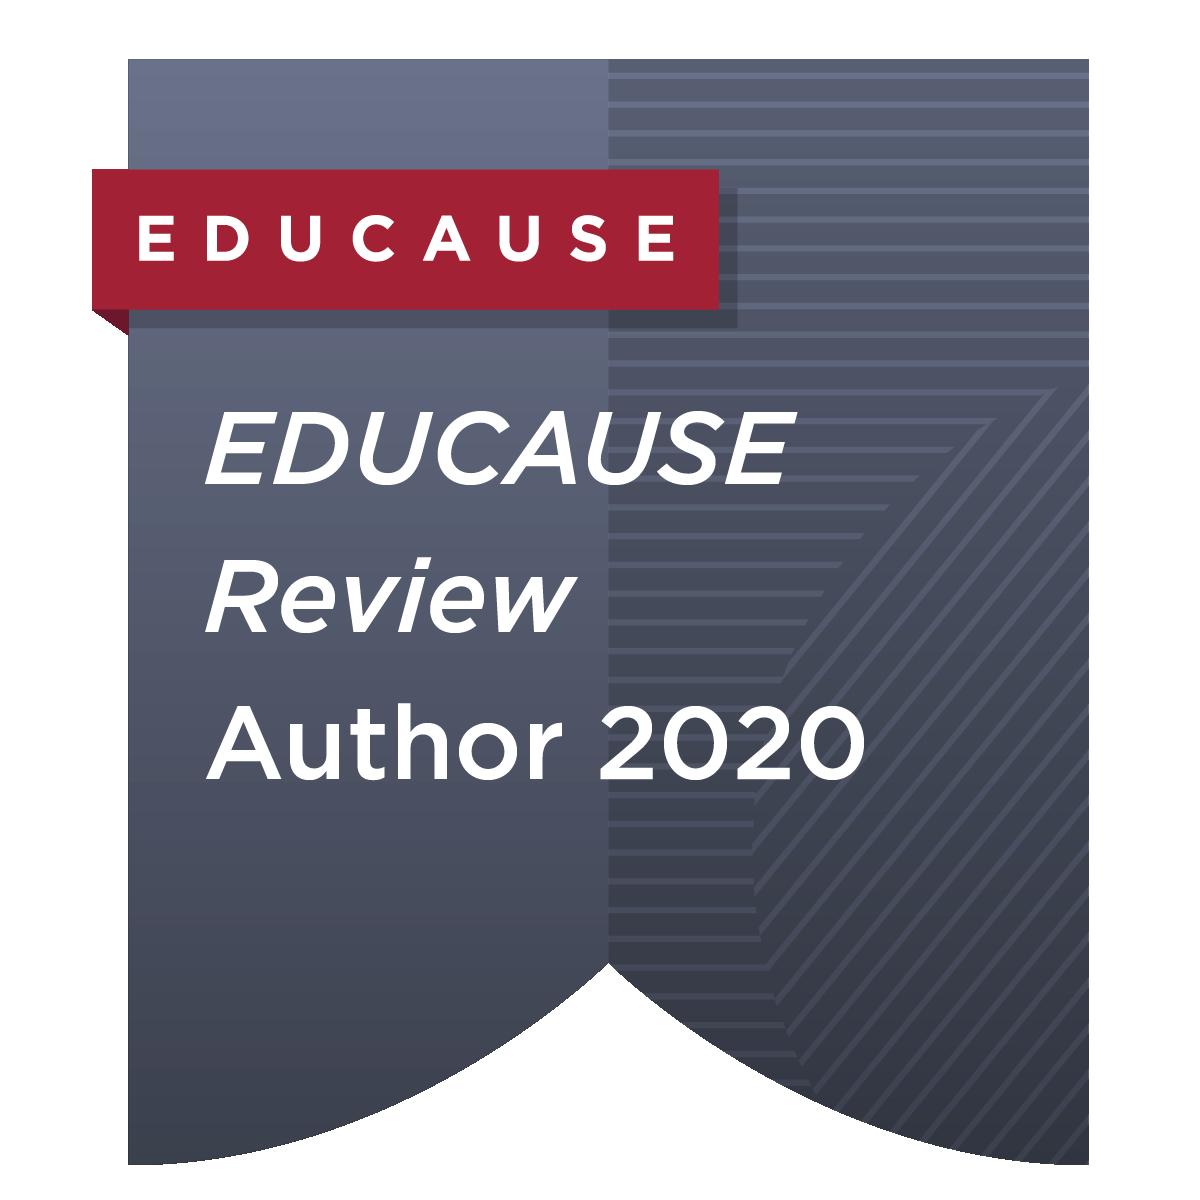 EDUCAUSE Review Author 2020